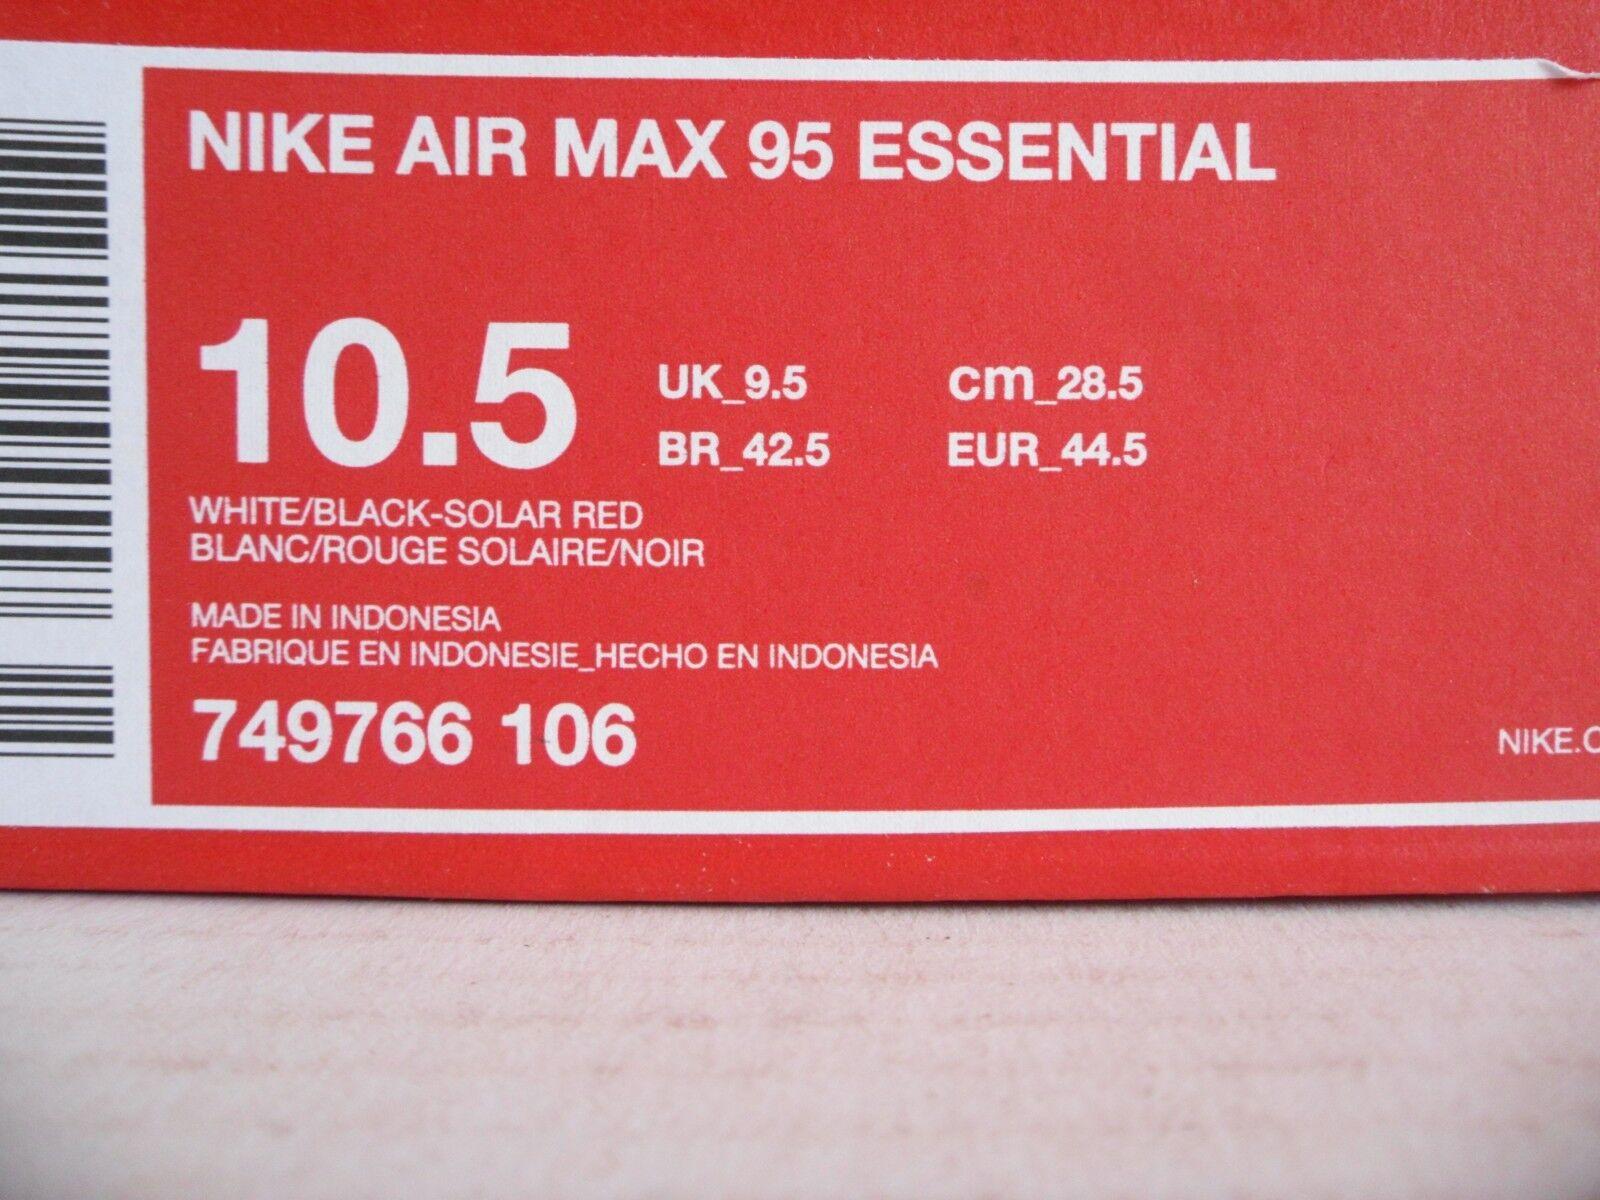 NIKE AIR MAX 95 SZ ESSENTIAL blanc-noir-SOLAR rouge SZ 95 10.5 [749766-106] 30bcb7